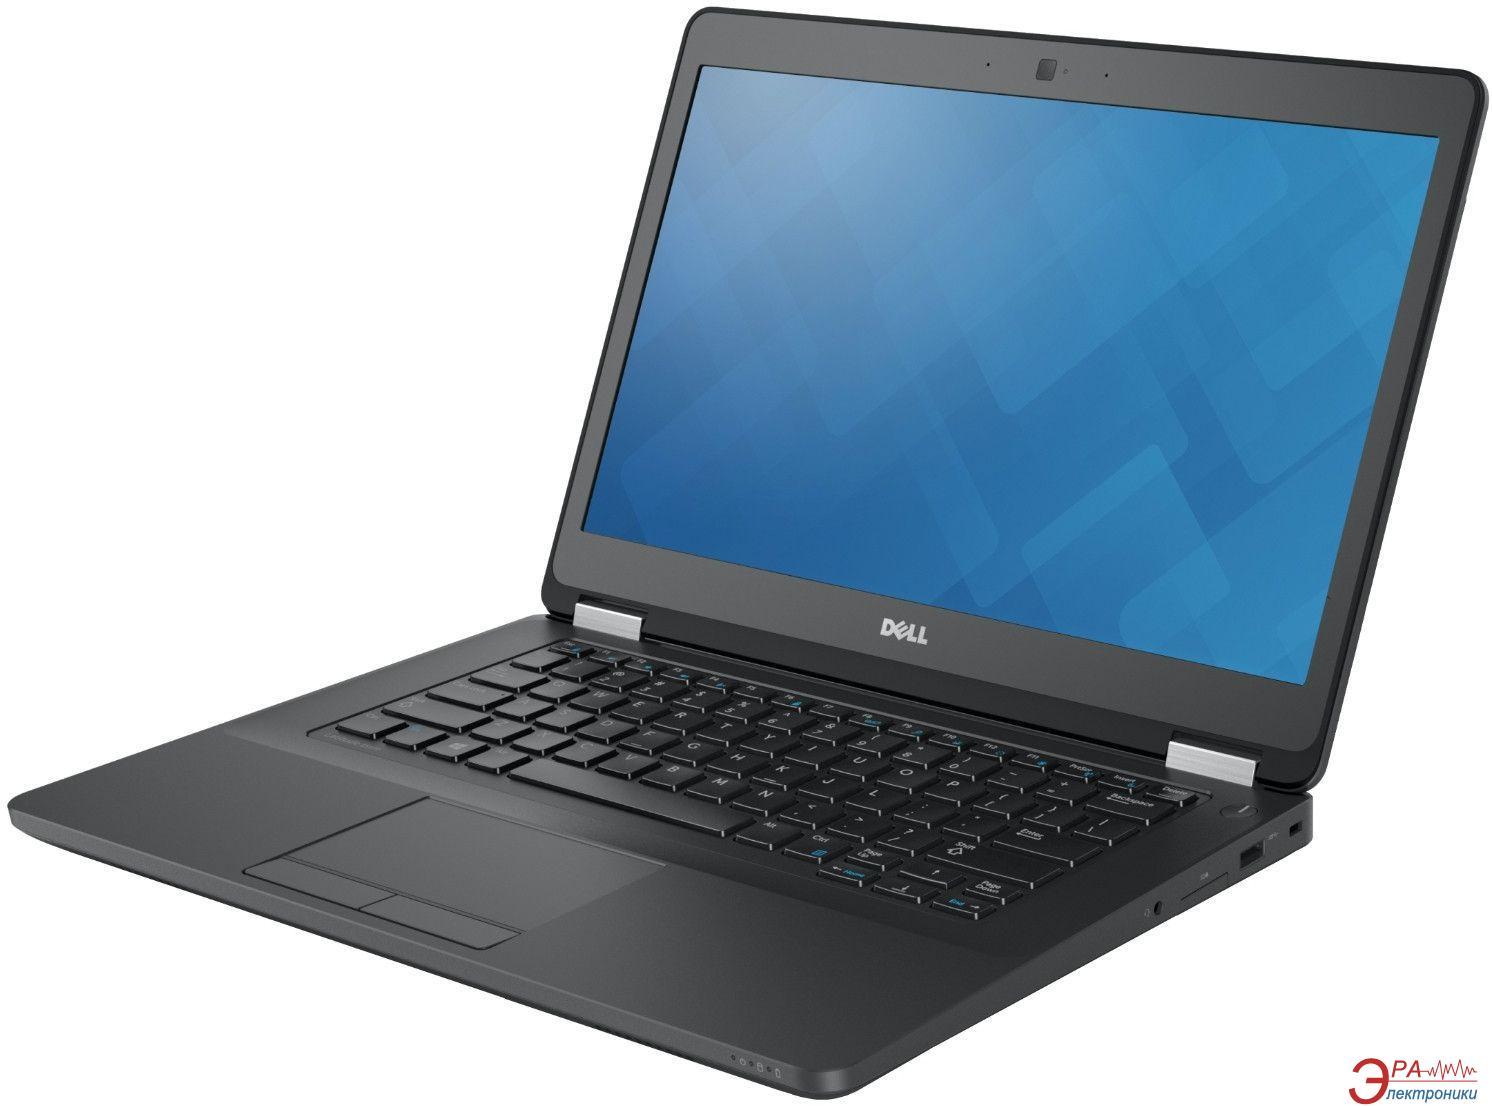 Ноутбук Dell Latitude E5470 (N041LE5470U14EMEA_ubu) Black 14